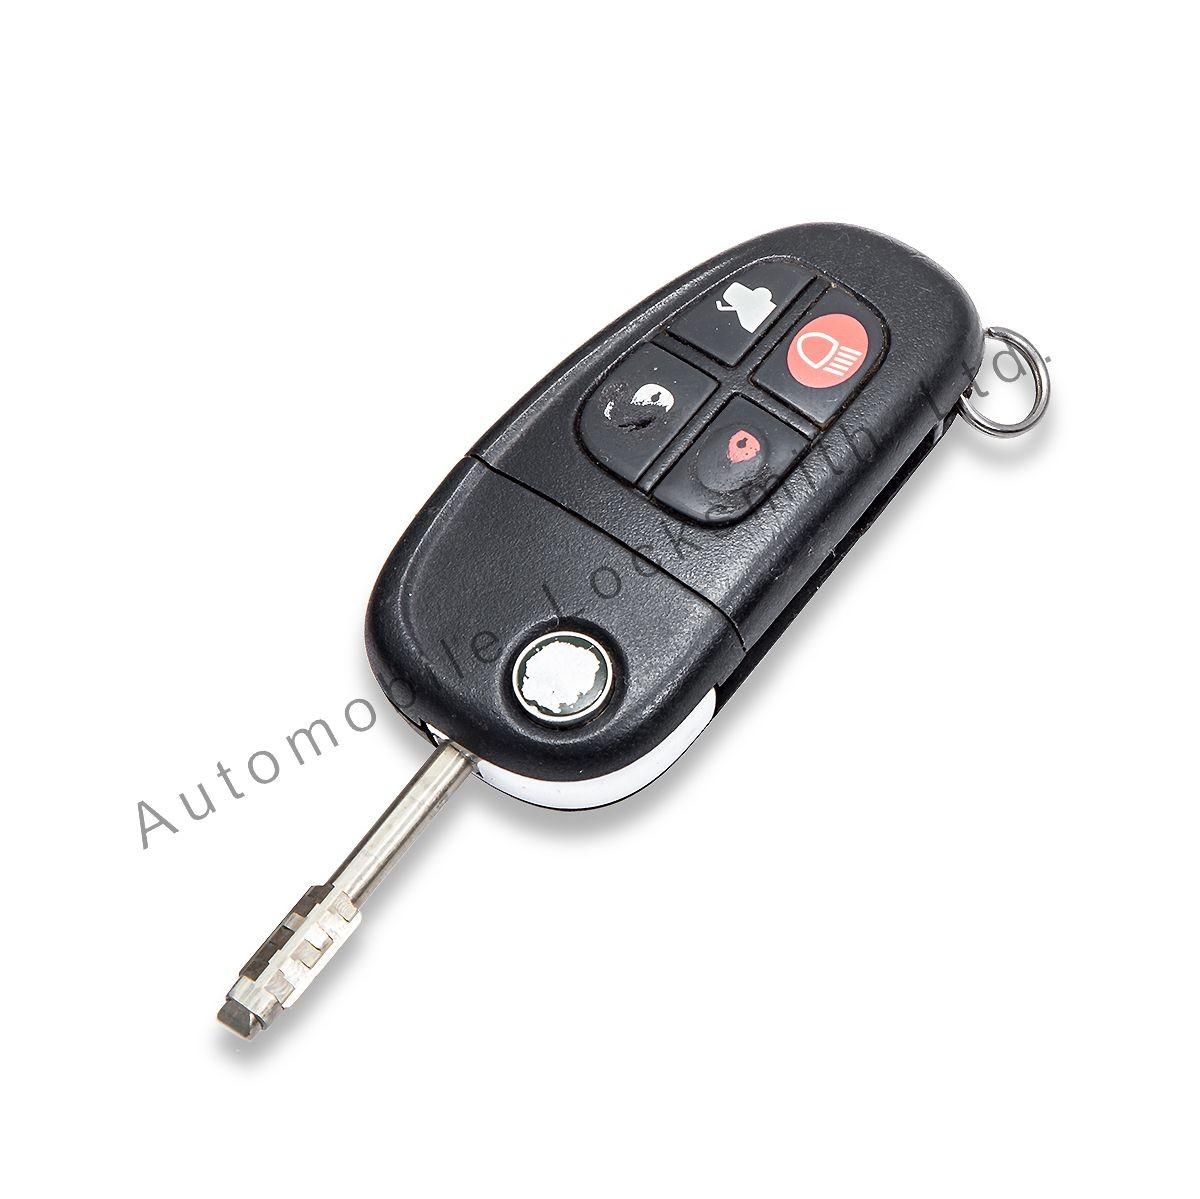 Repair Refurbishment Service for Jaguar X-Type S-Type XJ XJR 4 button remote key